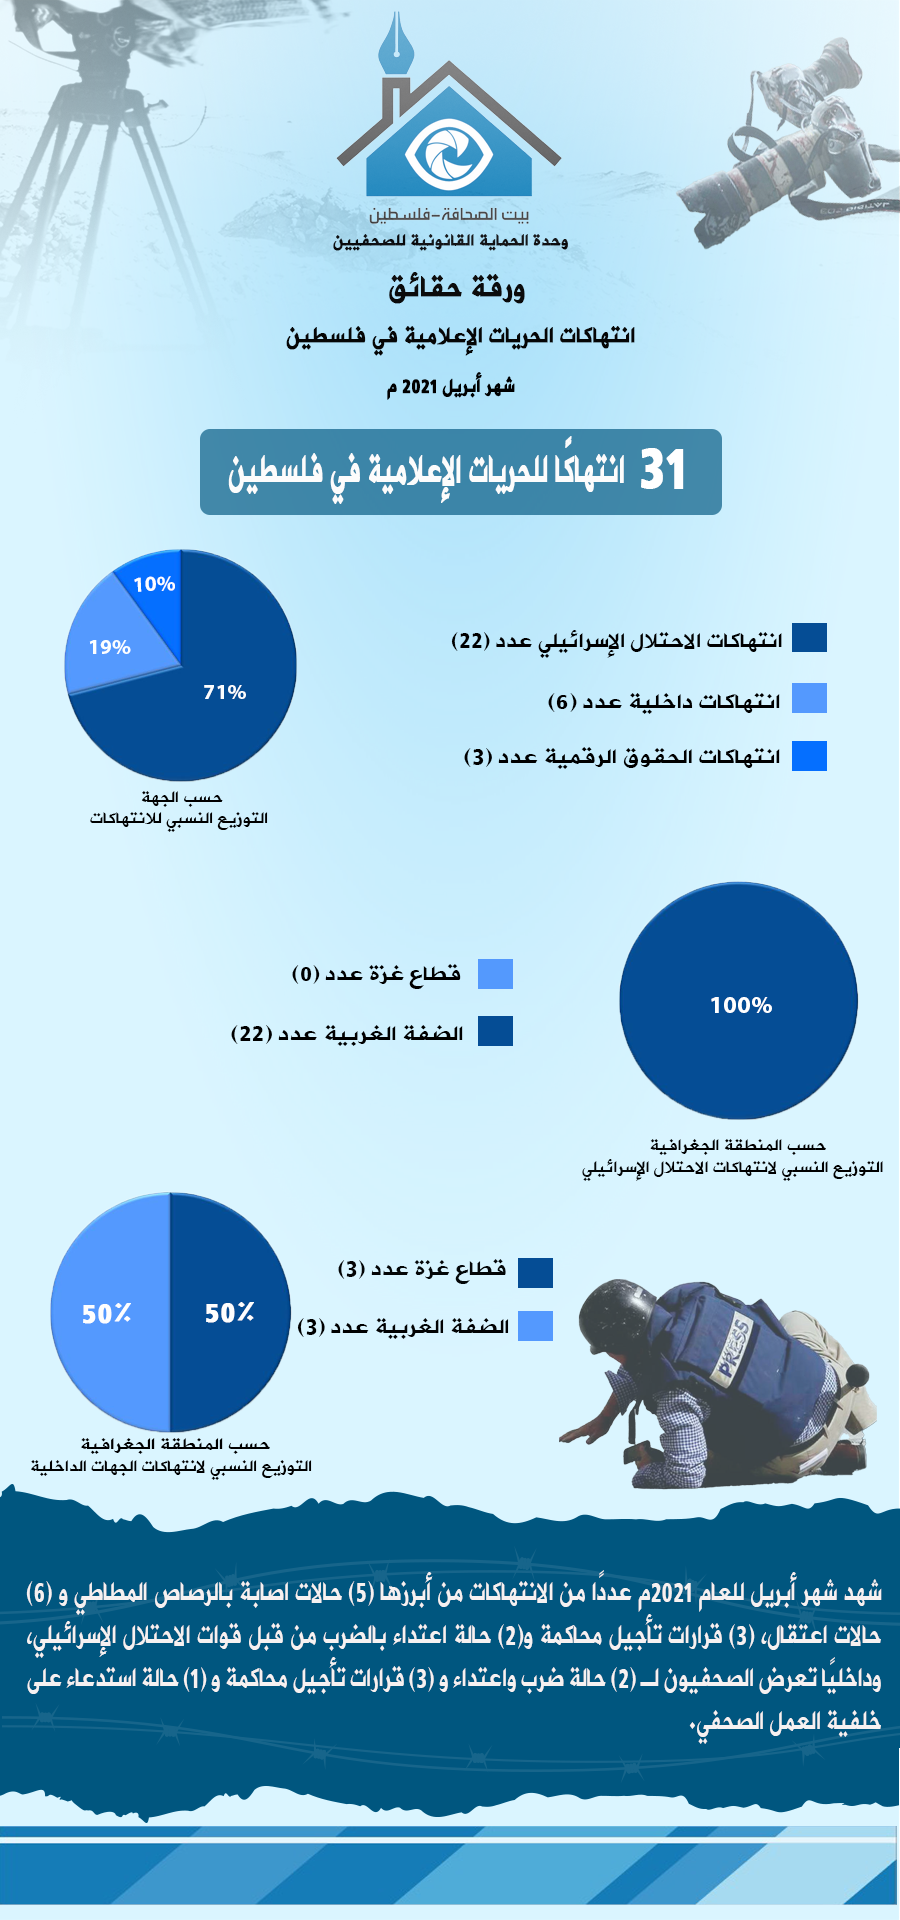 ورقة حقائق شهر 4 ابريل 2021 - عربي.png